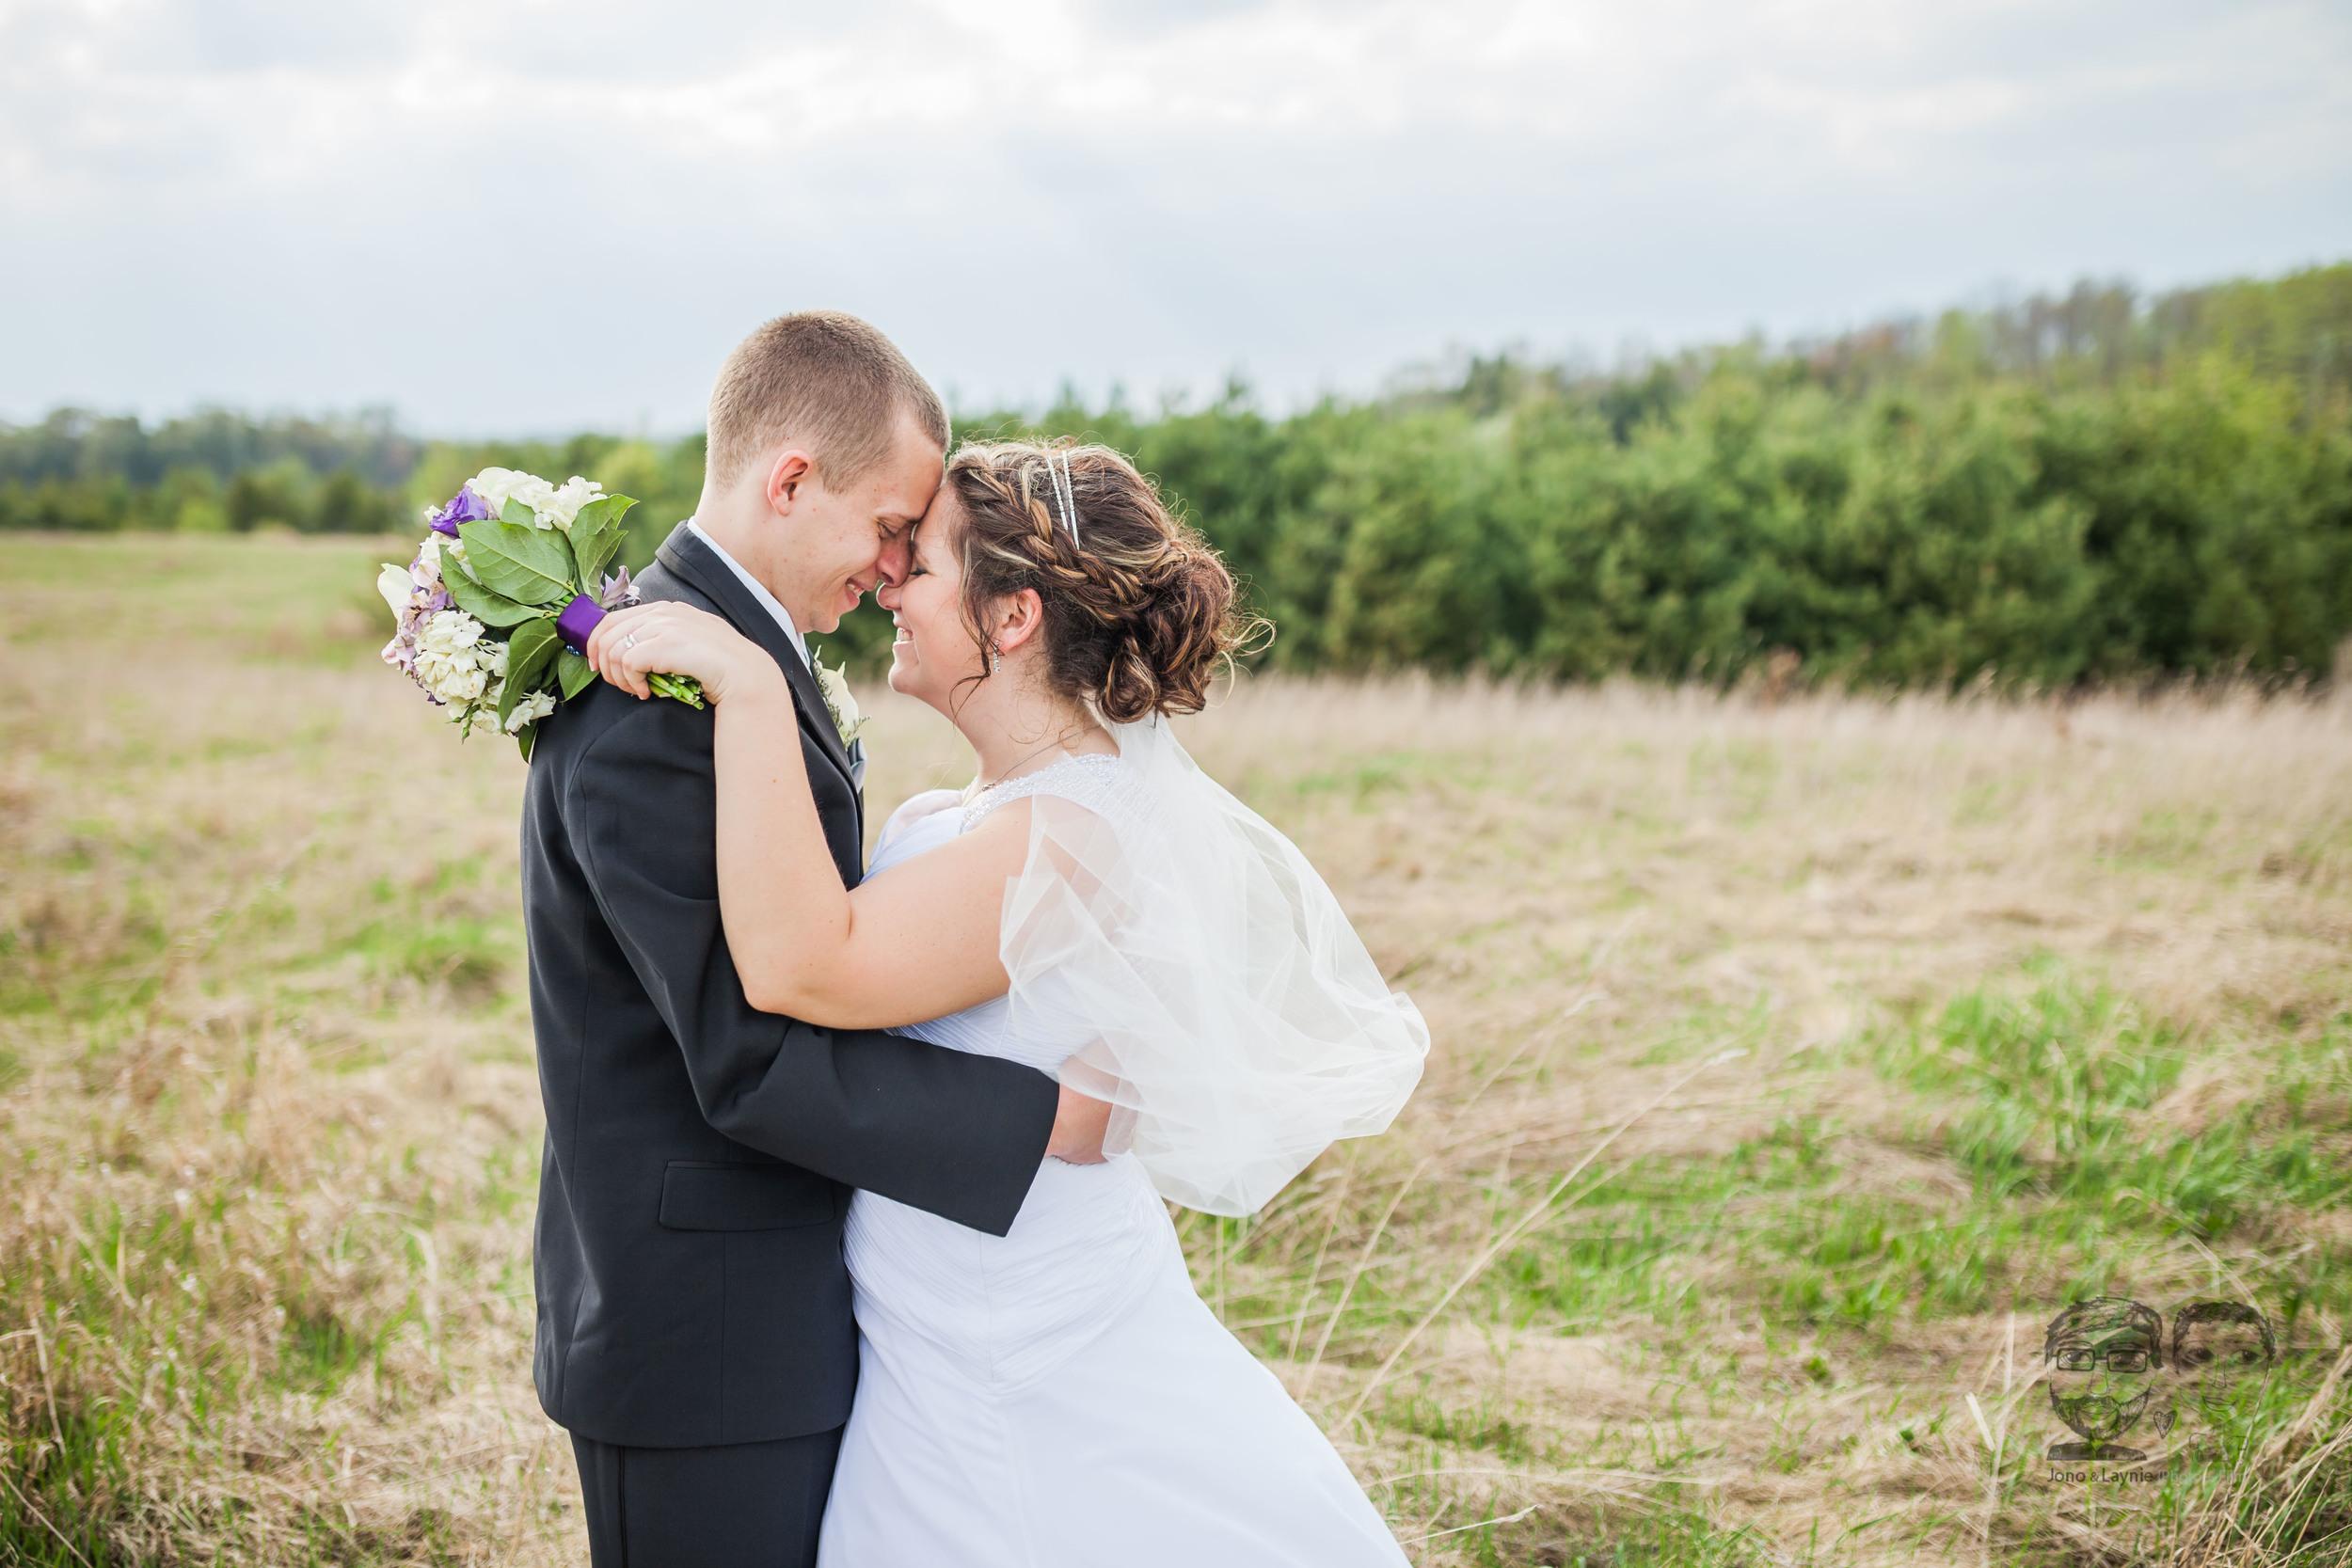 41Toronto Wedding Photographers and Videographers-Jono & Laynie Co.-Orangeville Wedding.jpg